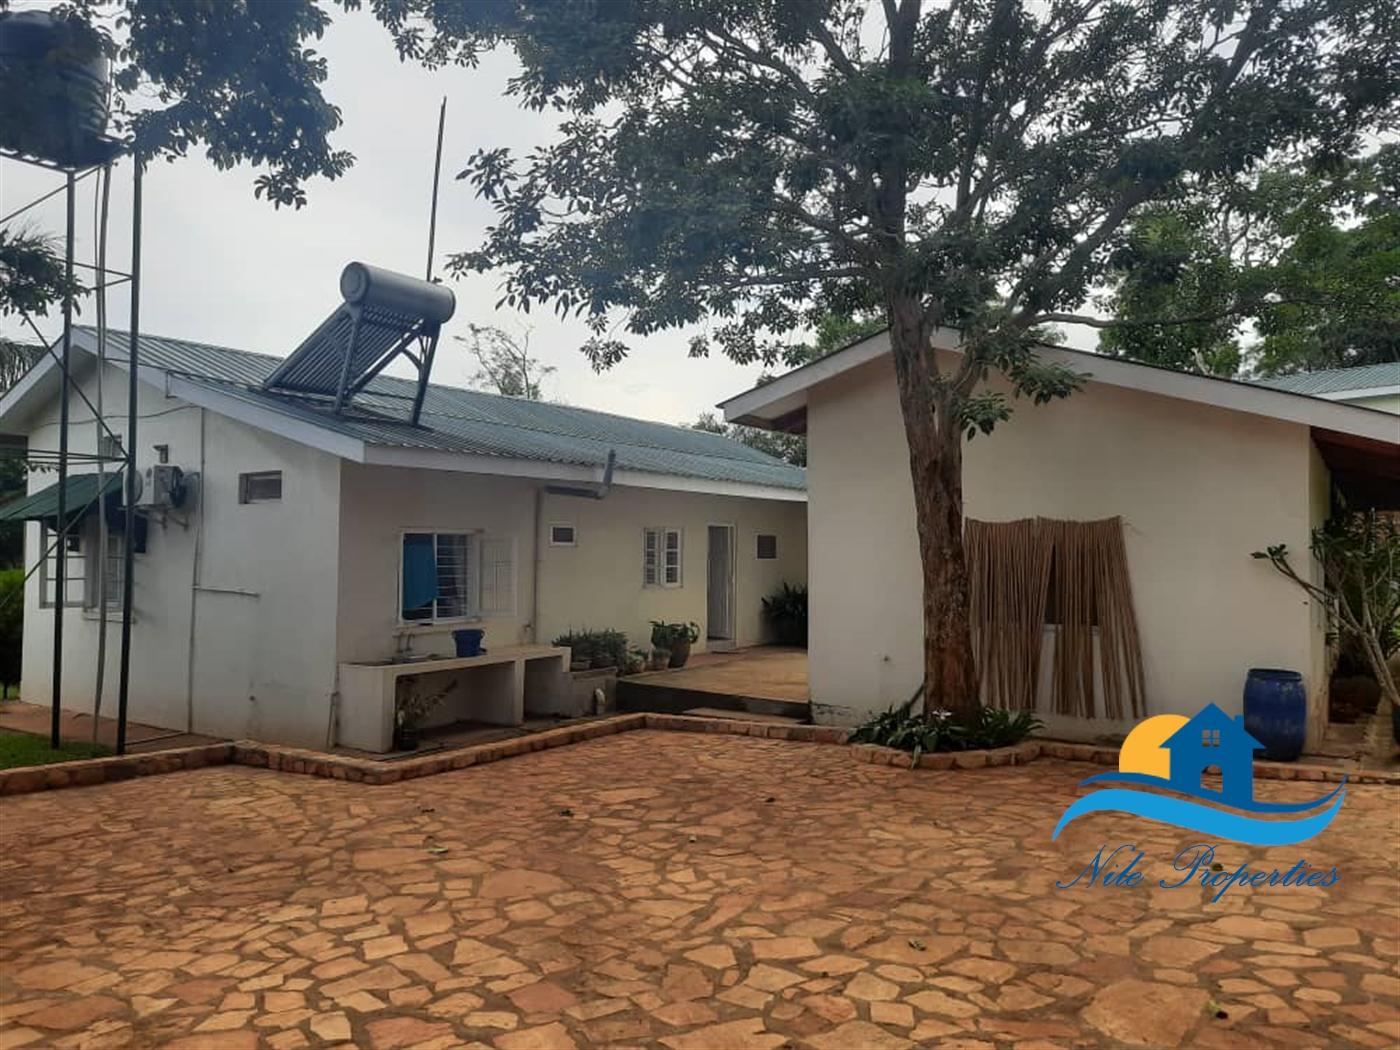 Storeyed house for sale in Jinjagolfcourse Jinja